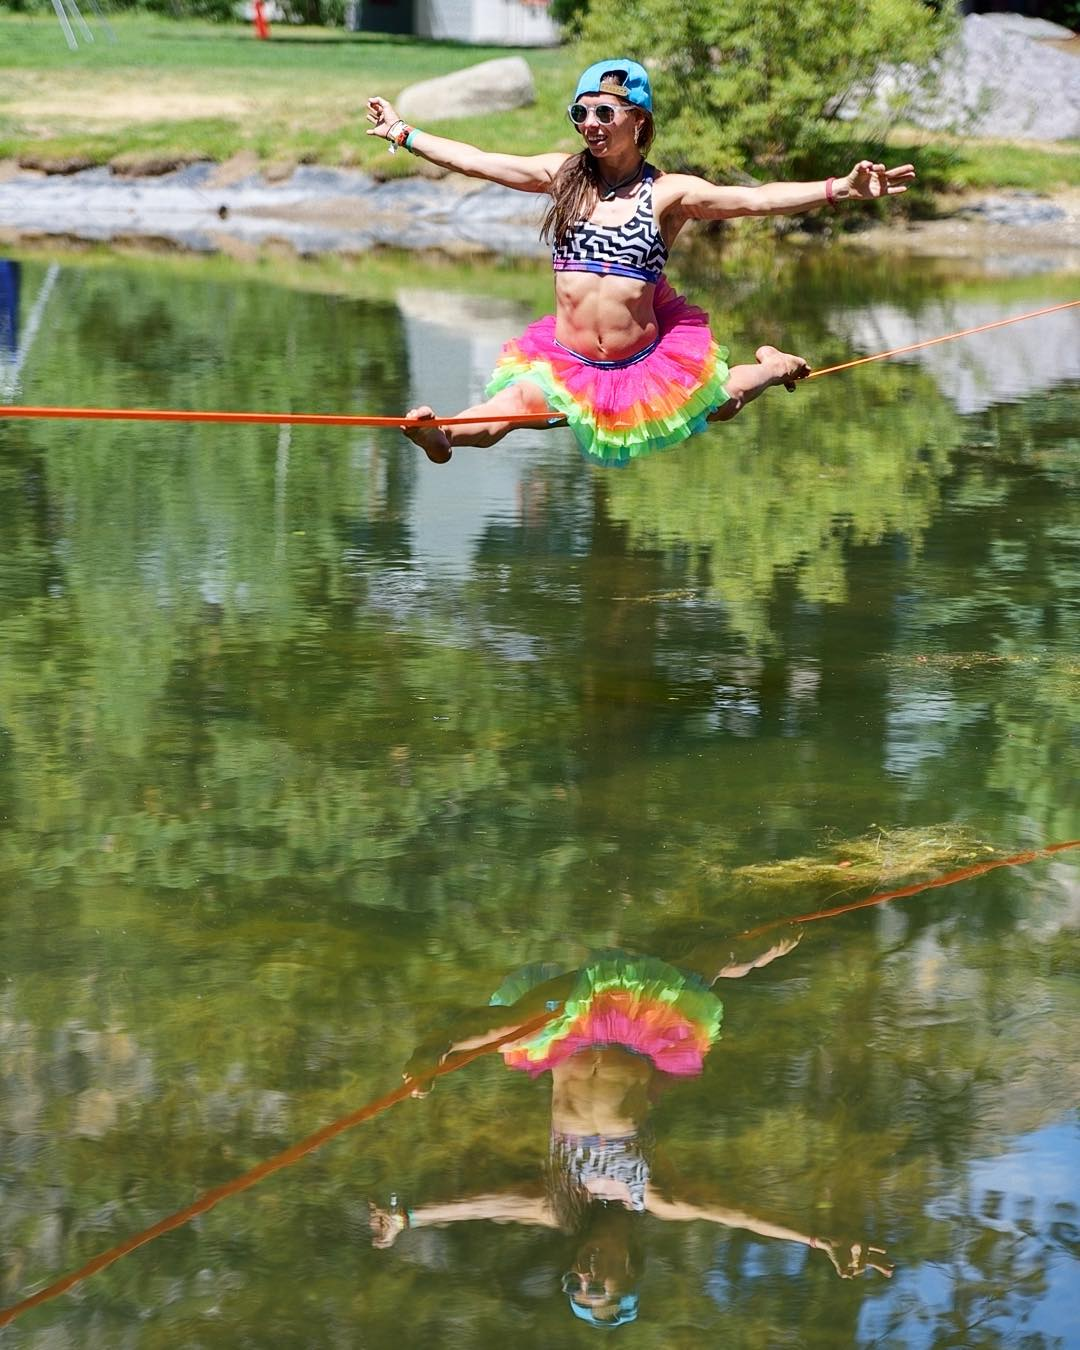 Dipseas do amazing things for your balancing ability! (No promises...) Epic photo of @lizasouras captured by @a4gpa #ericwardphotography #yogaslackers #slacklife #slacklineyoga